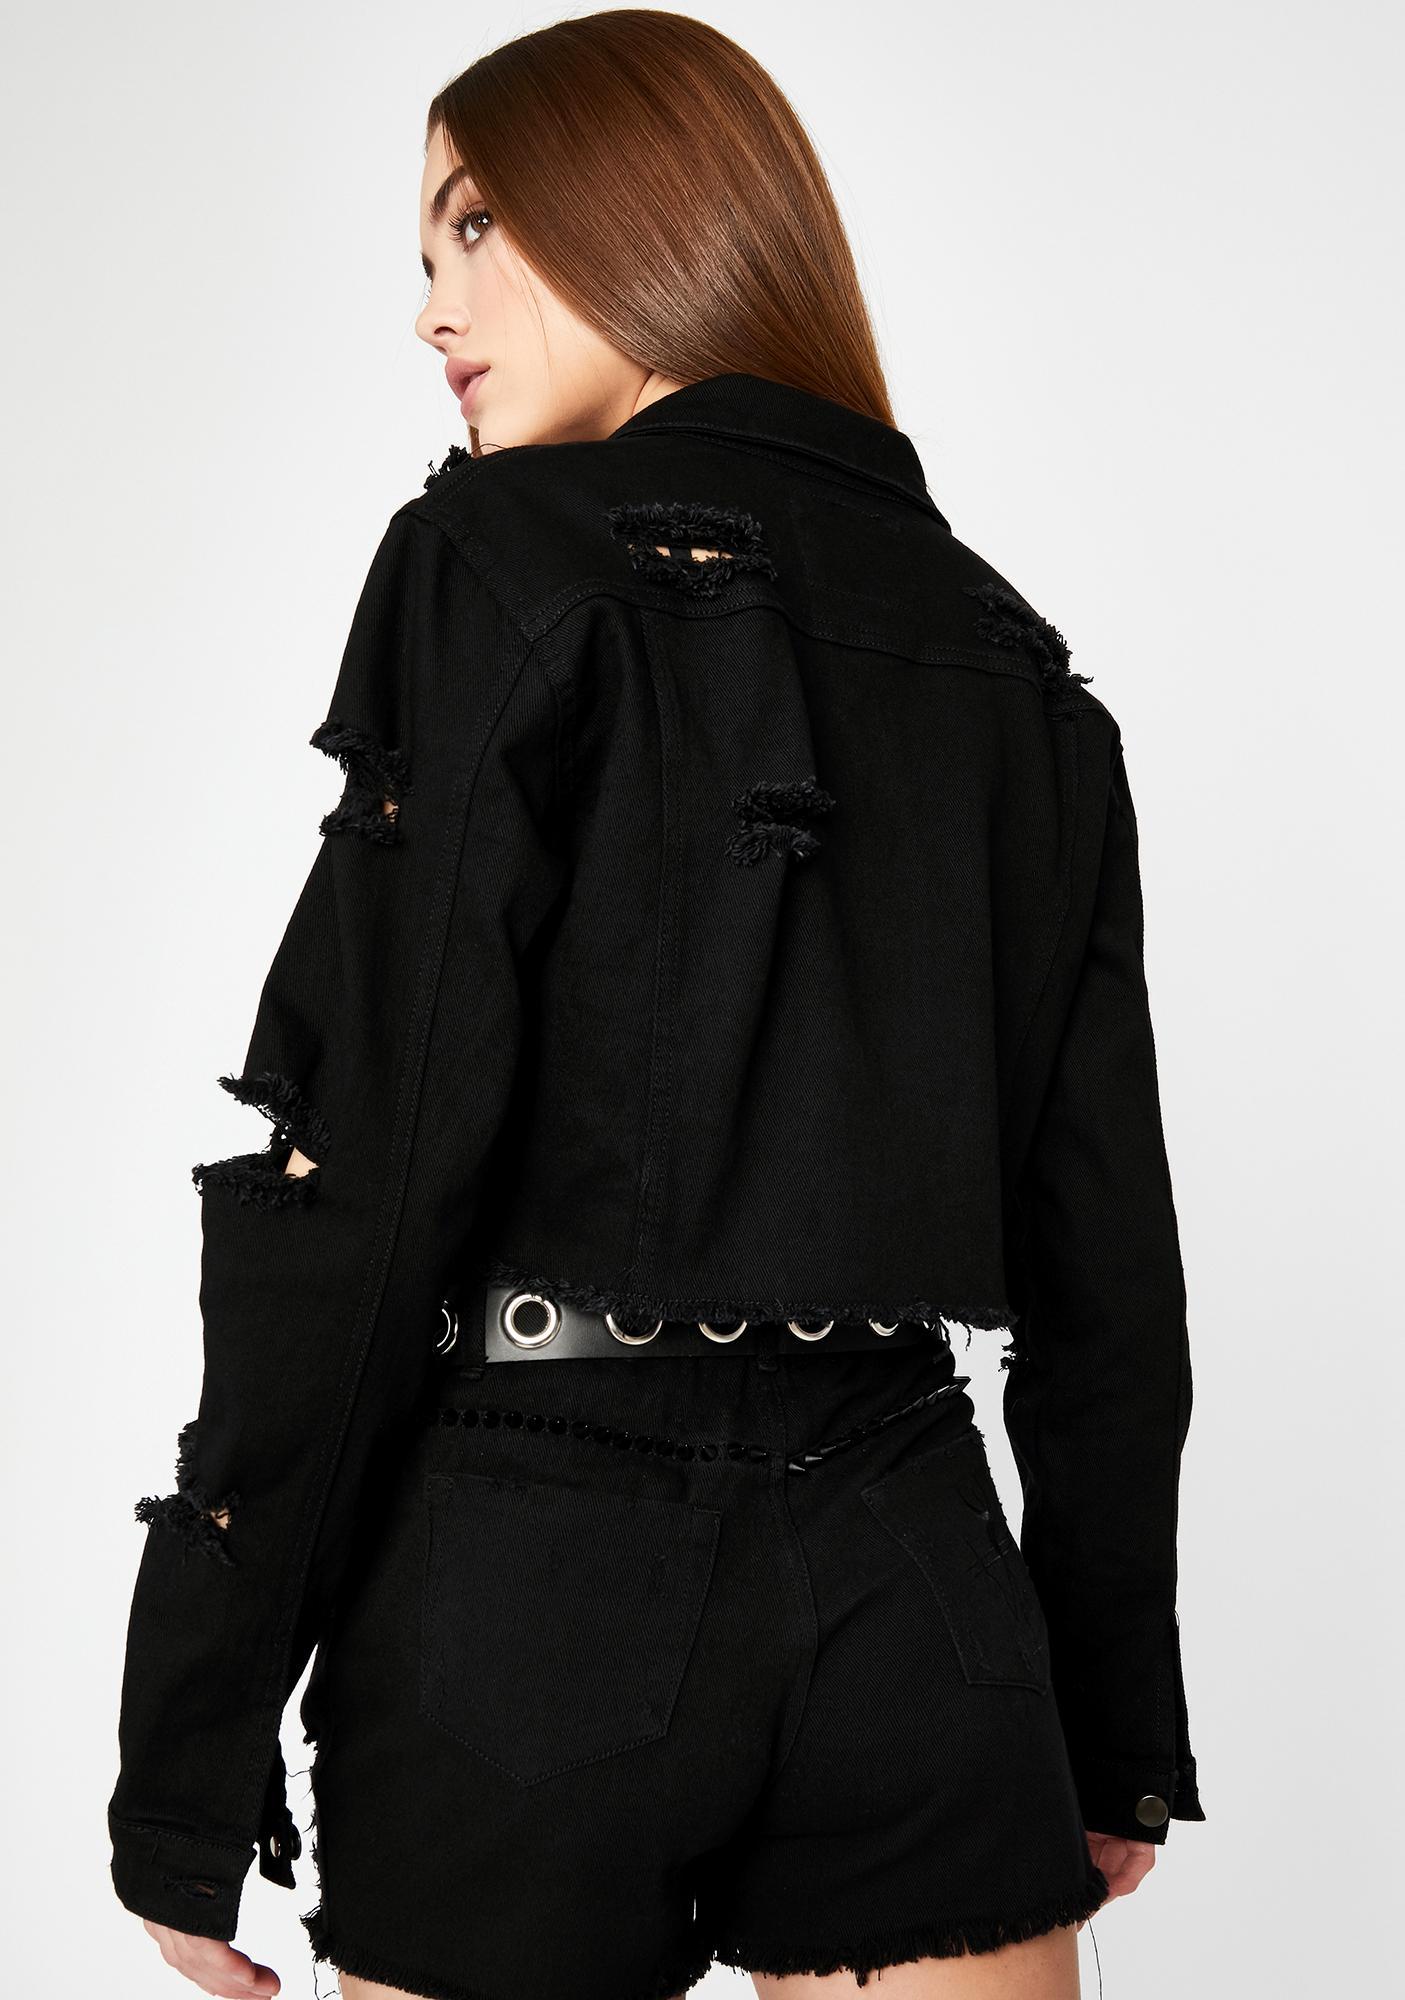 Unchecked Attitude Crop Denim Jacket